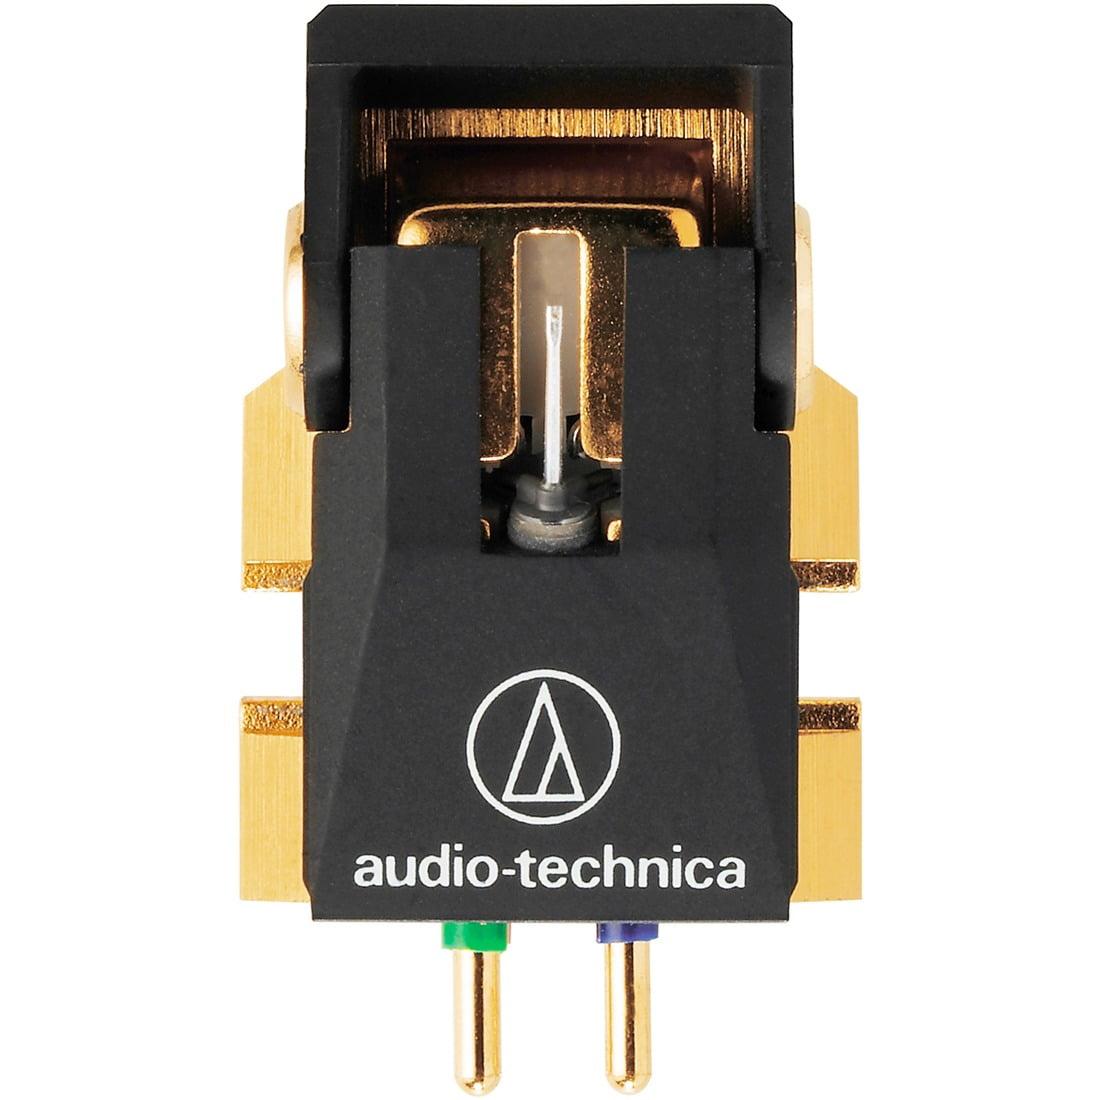 Audio-Technica AT150Sa cartridge by Audio-Technica